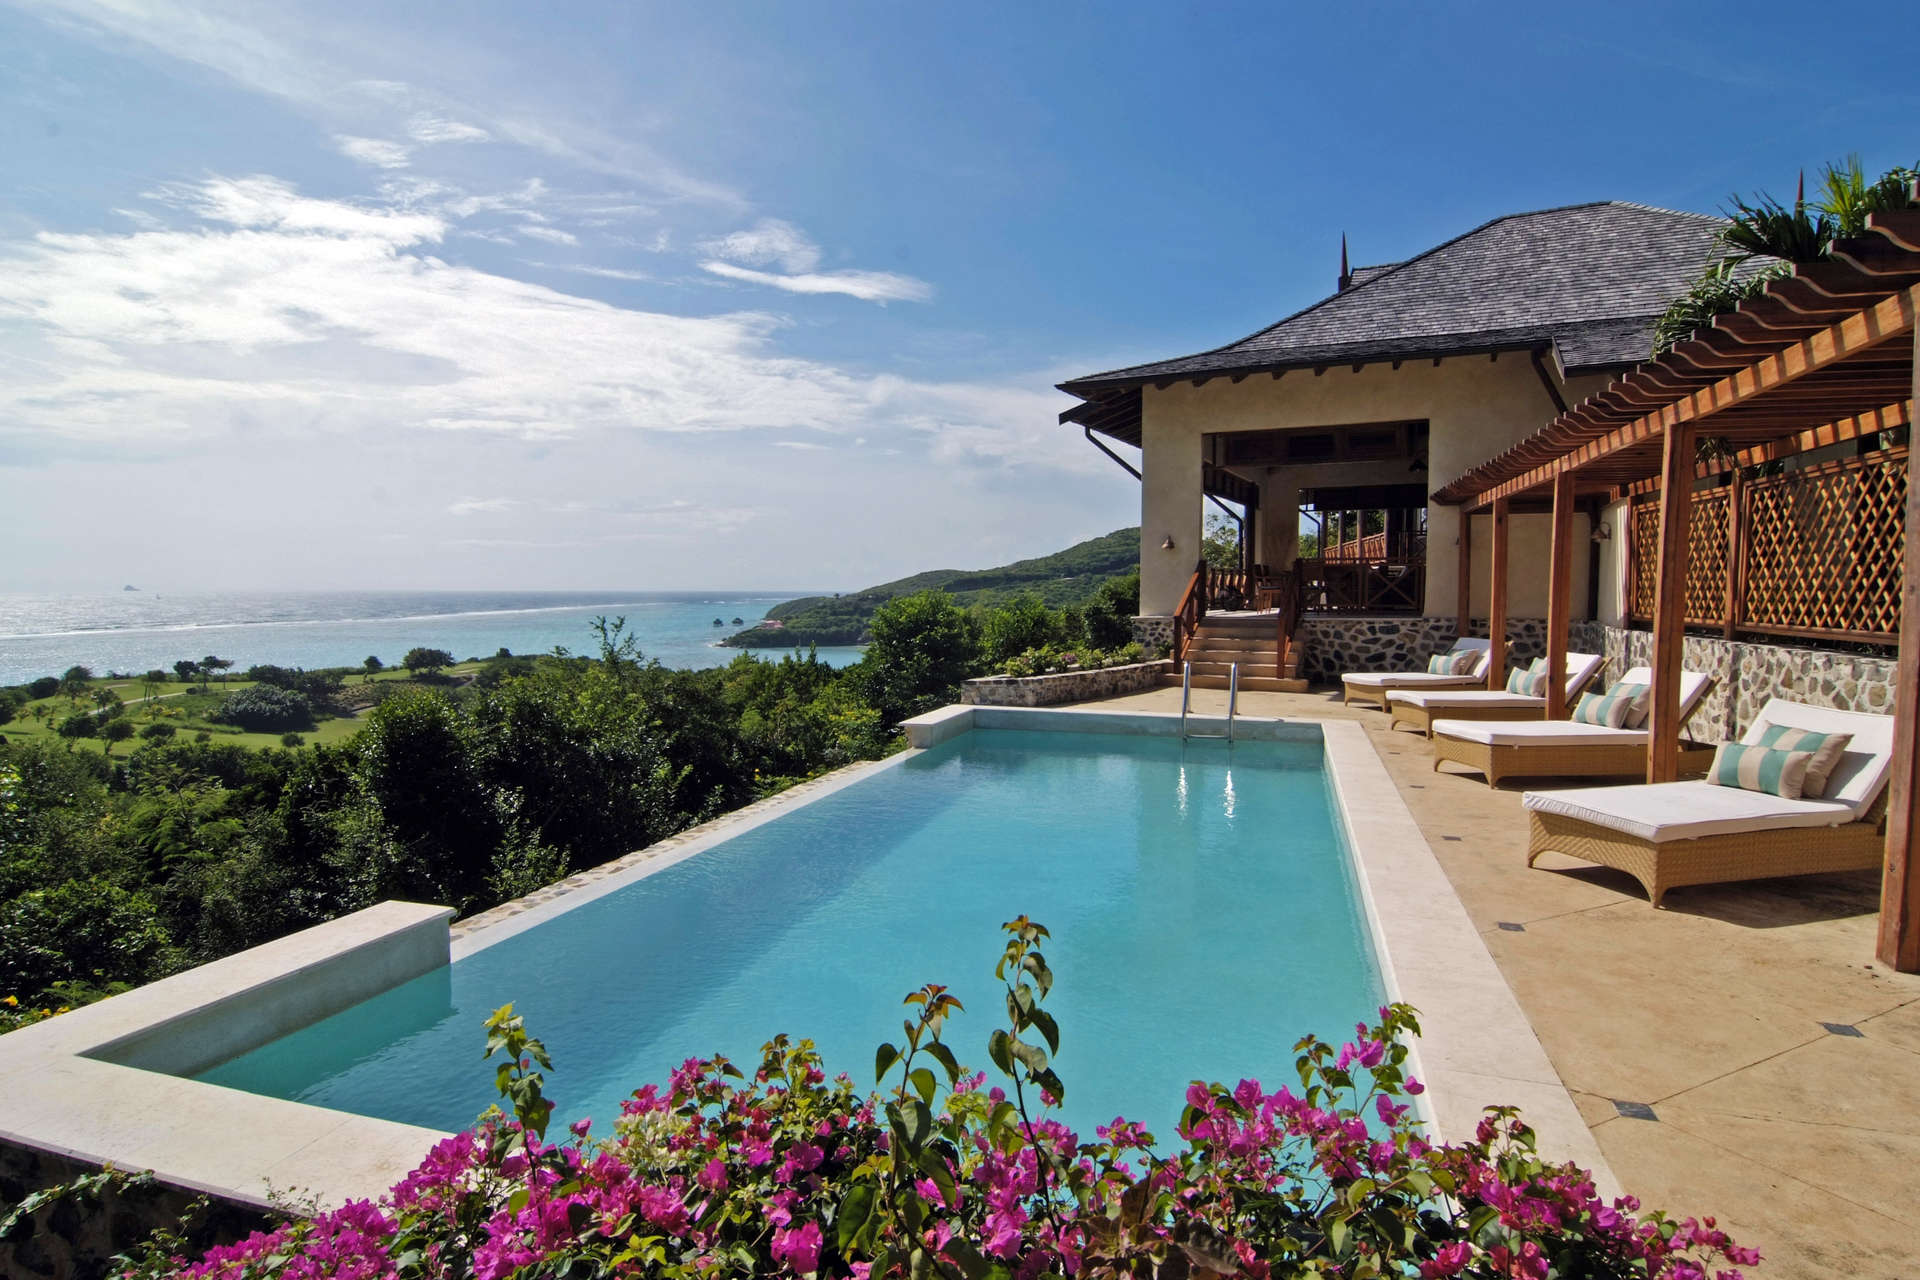 Luxury villa rentals caribbean - St vincent and the grenadines - Canouan - No location 4 - Villamia - Image 1/12